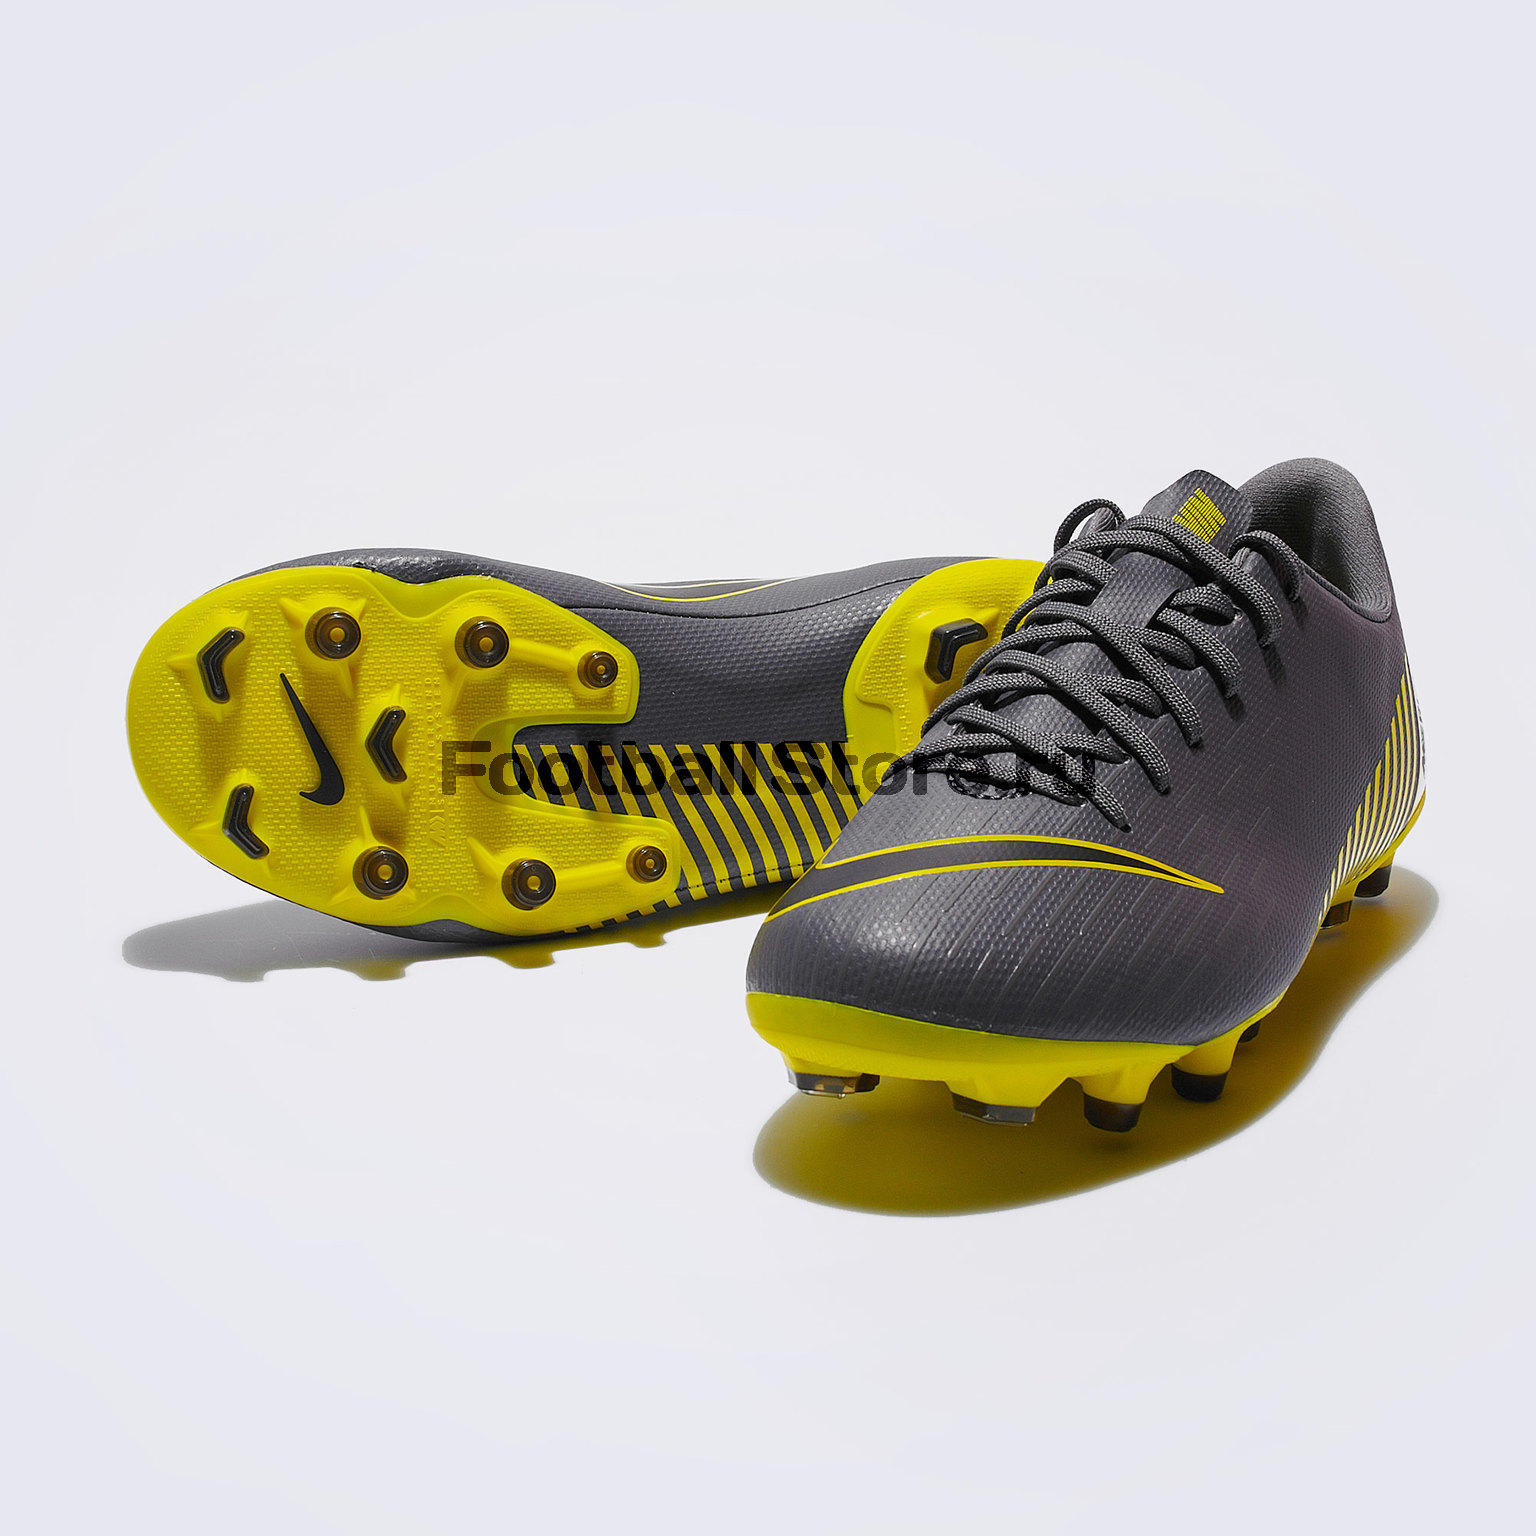 Бутсы детские Nike Vapor 12 Academy GS FG/MG AH7347-070 бутсы детские nike superfly 6 academy gs fg mg ah7337 060